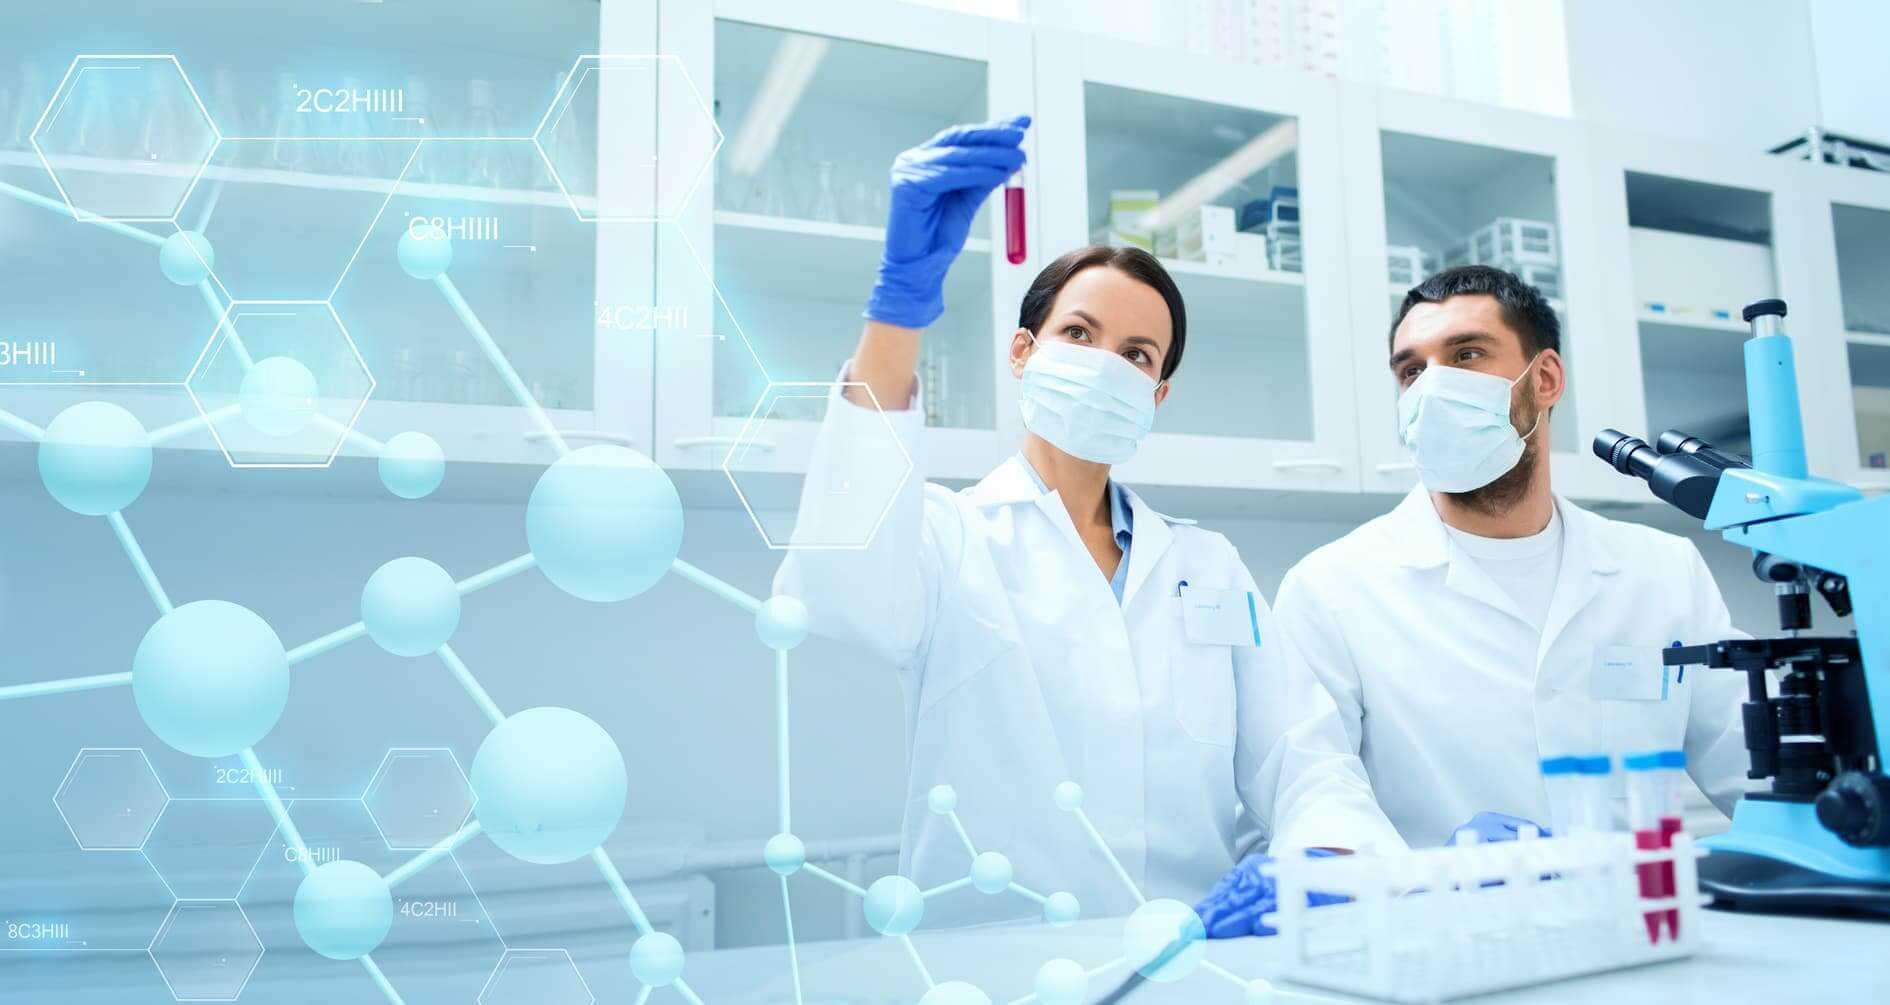 Azoth Cannabidiol CBD Olie Groothandel Biologisch THC Vrij Kwaliteit